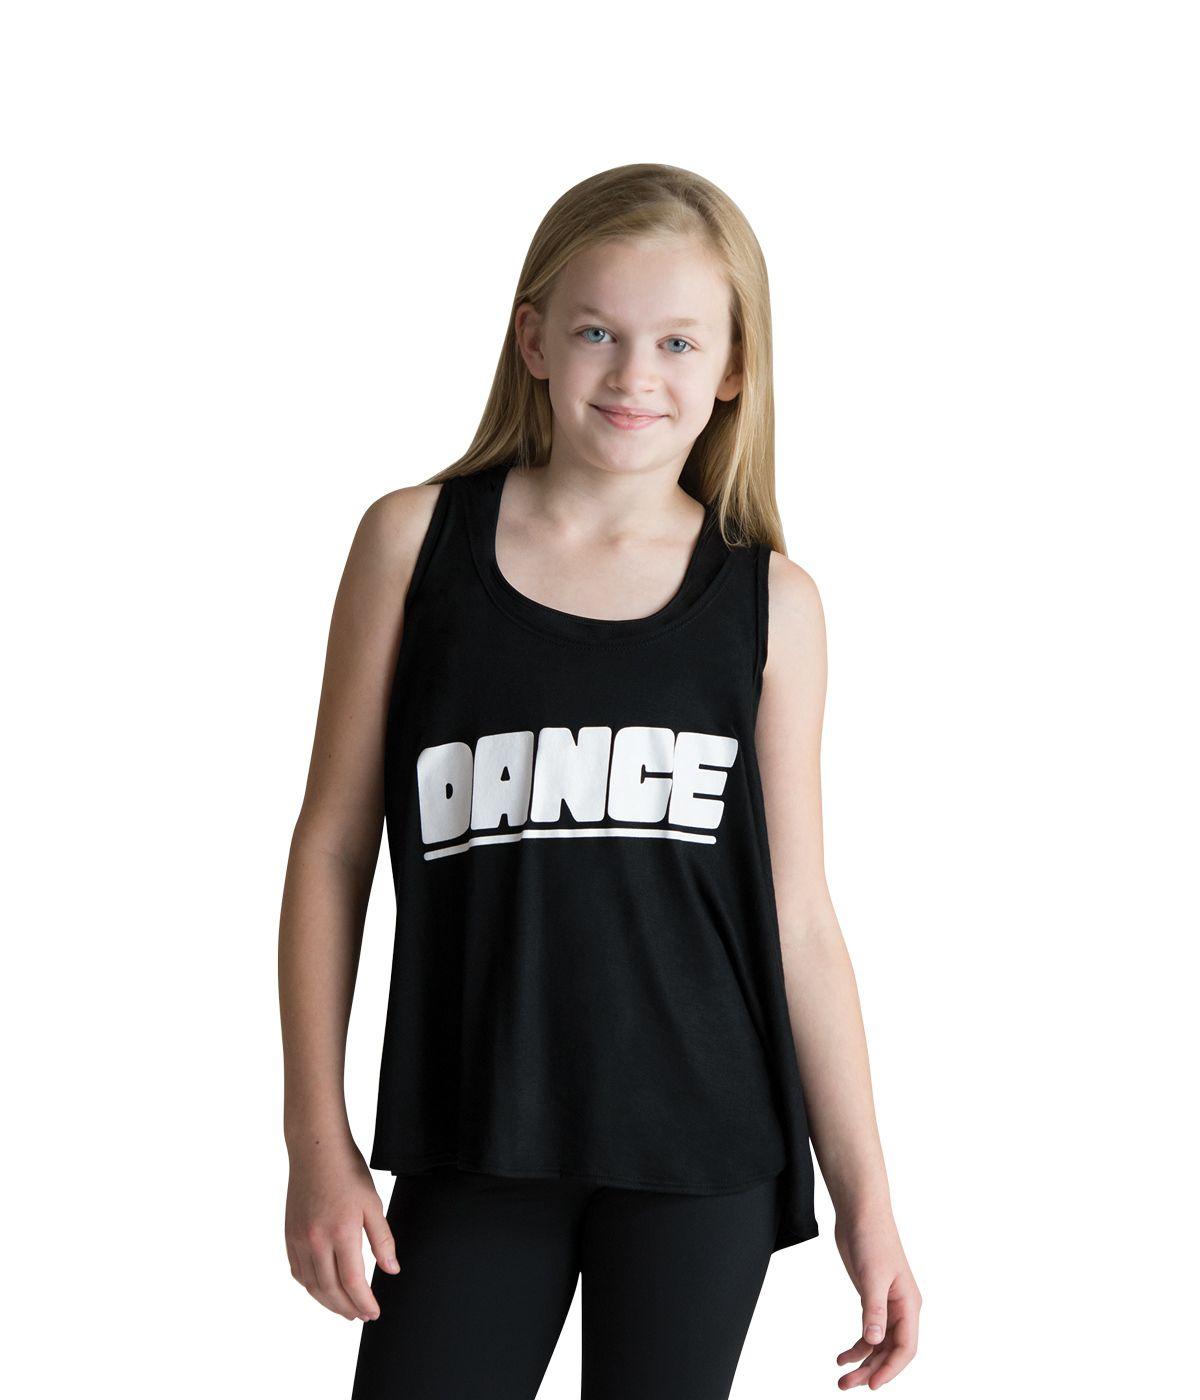 6b78d28a34b2 Kids and Adult Dance Drape Tank Top by MotionWear in Black #4505 ...